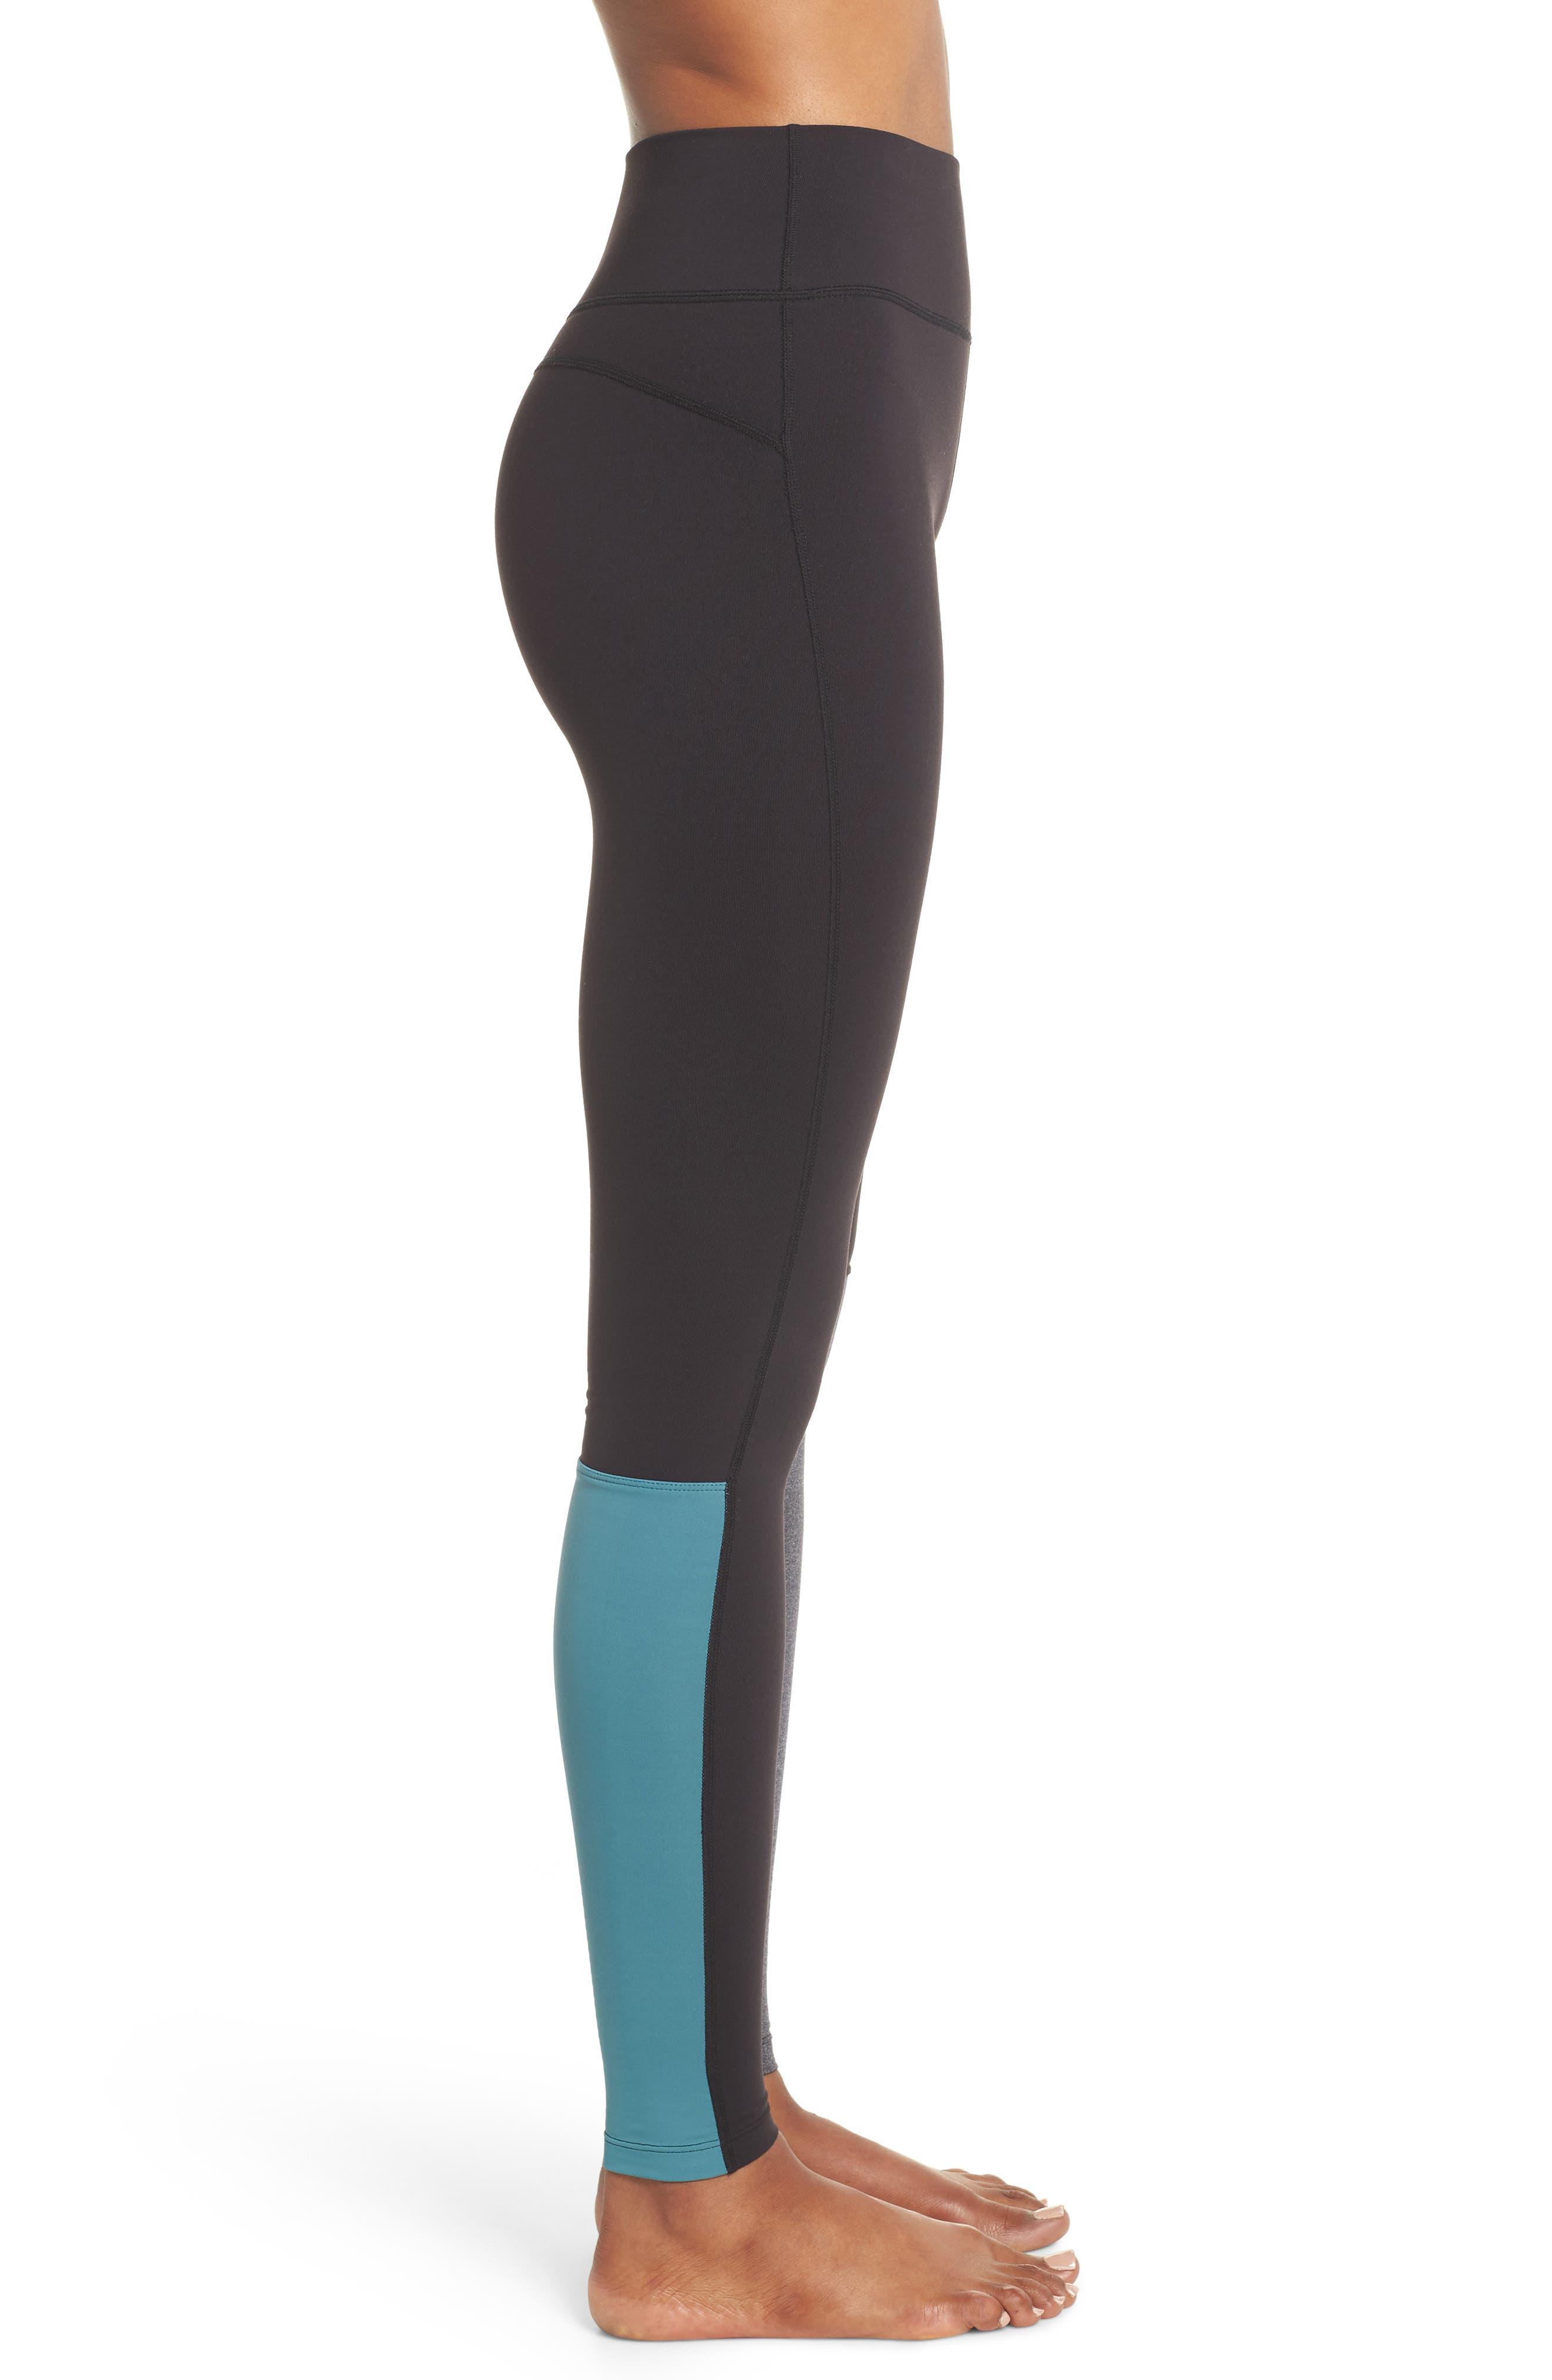 Flash Leggings,                             Alternate thumbnail 3, color,                             Black/ Heather Grey/ Blue Surf